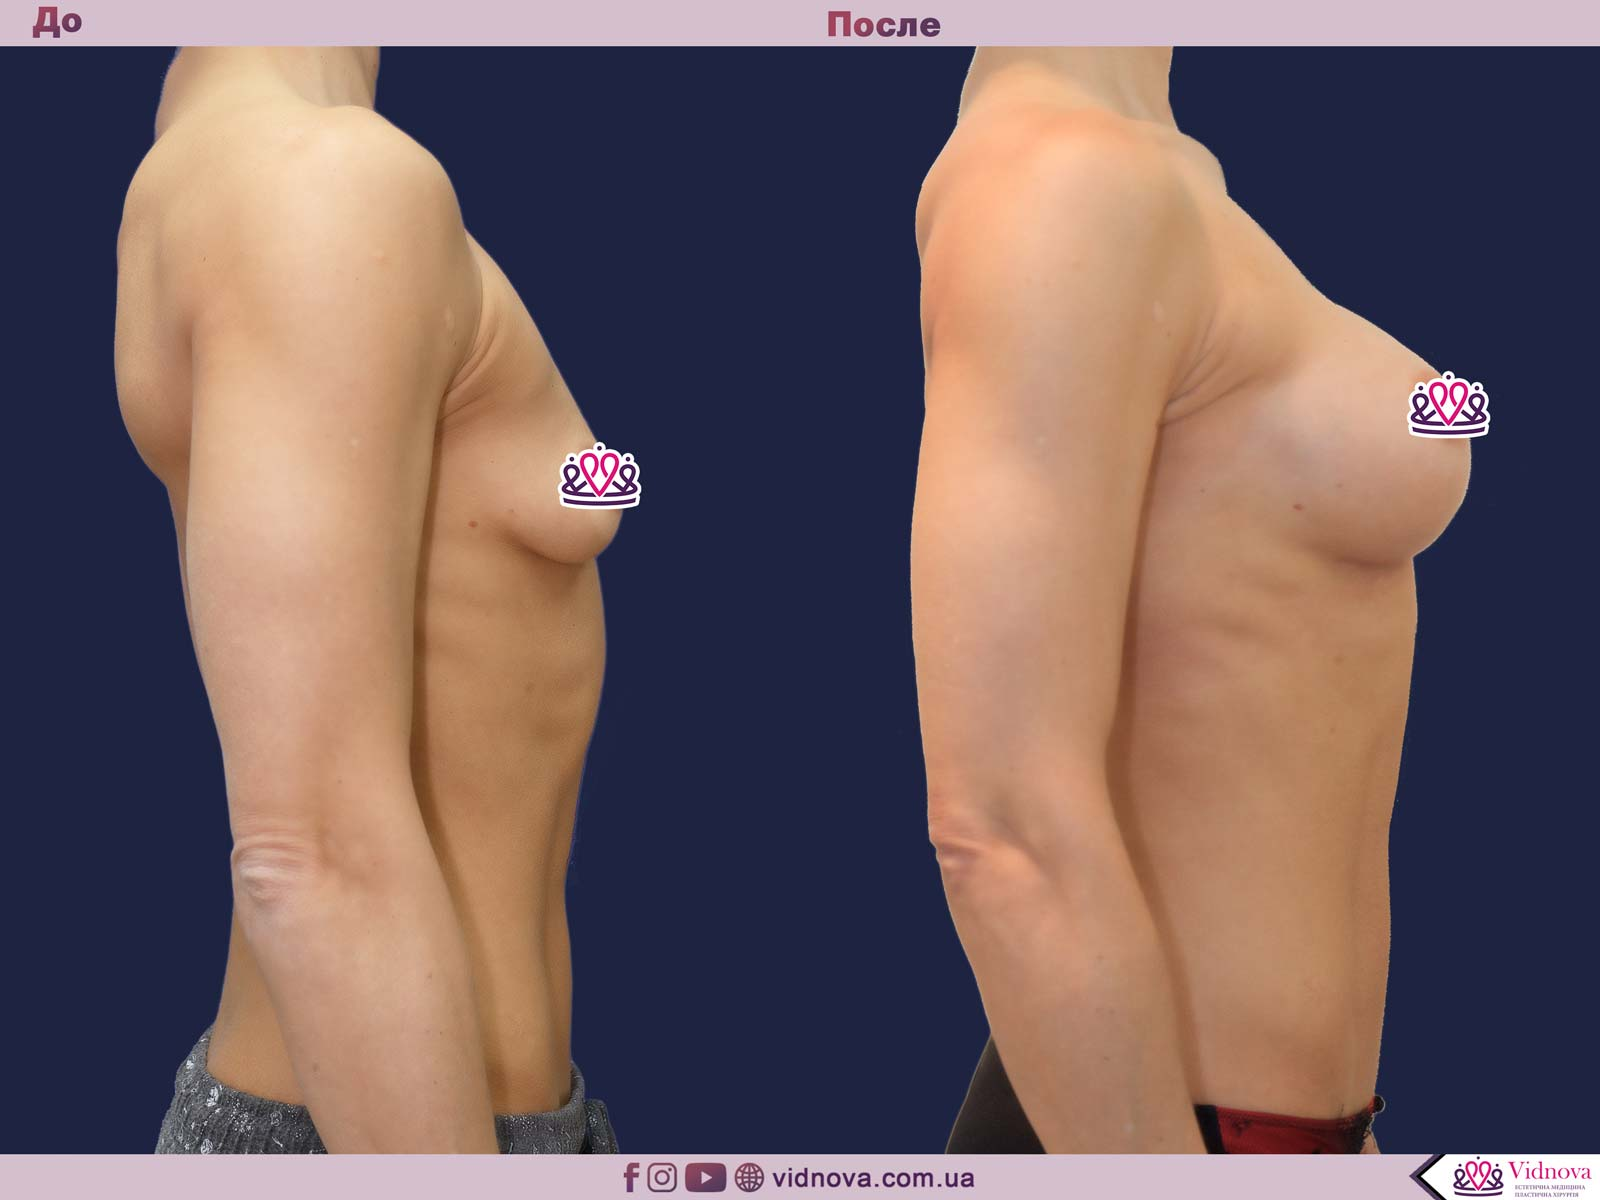 Увеличение груди: Фото ДО и ПОСЛЕ - Пример №67-3 - Клиника Vidnova